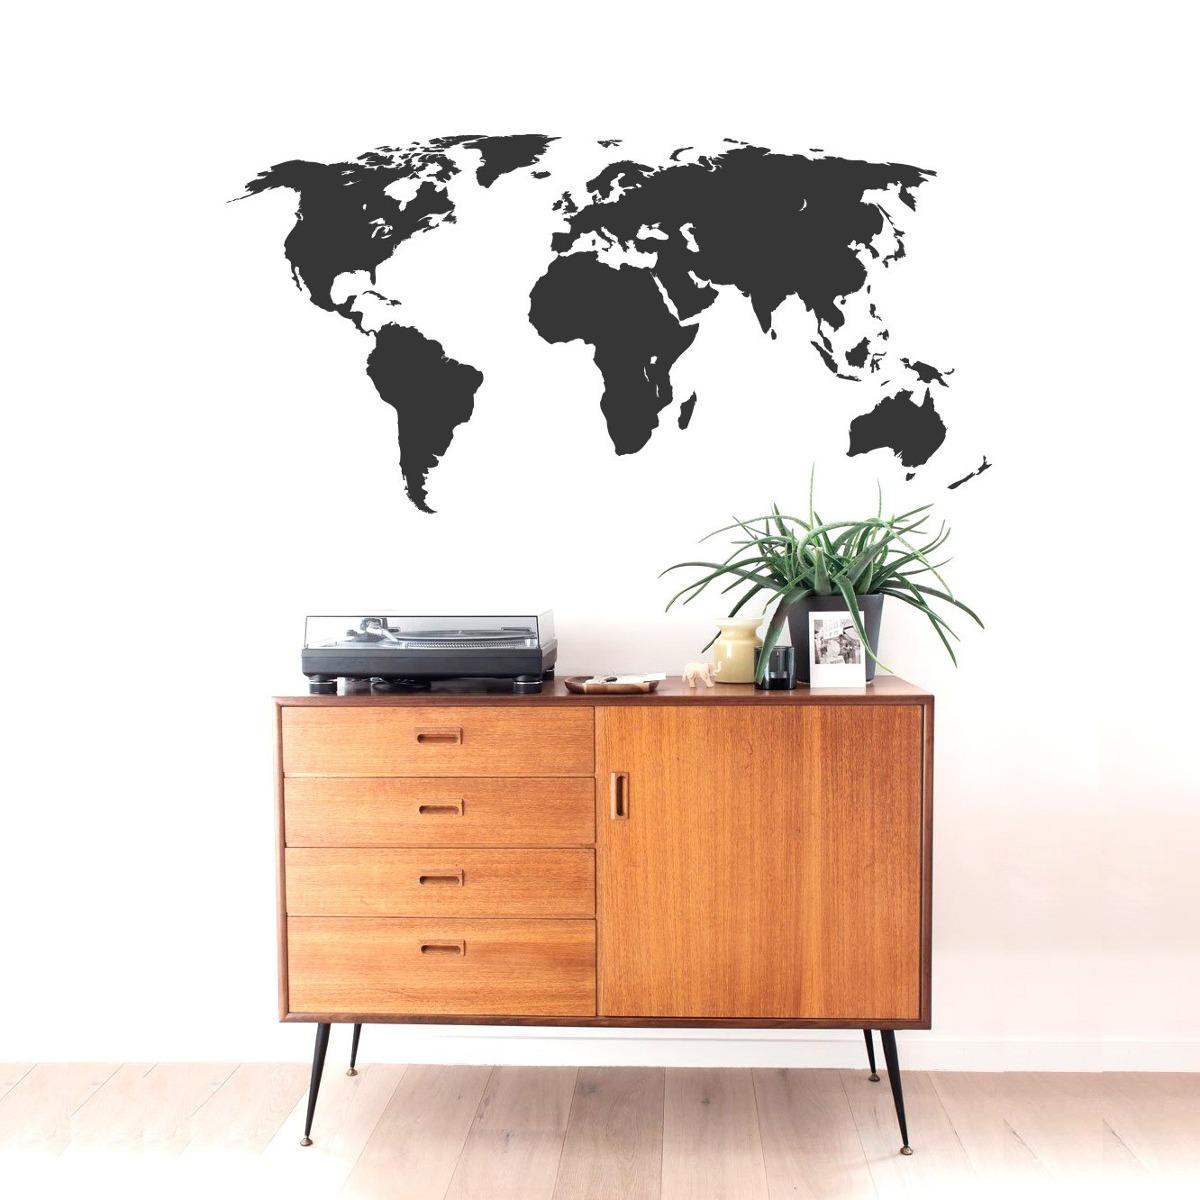 madeira mapa mundo Adesivo Decorativo Parede Vidro Madeira Mapa Mundi   R$ 33,99 em  madeira mapa mundo